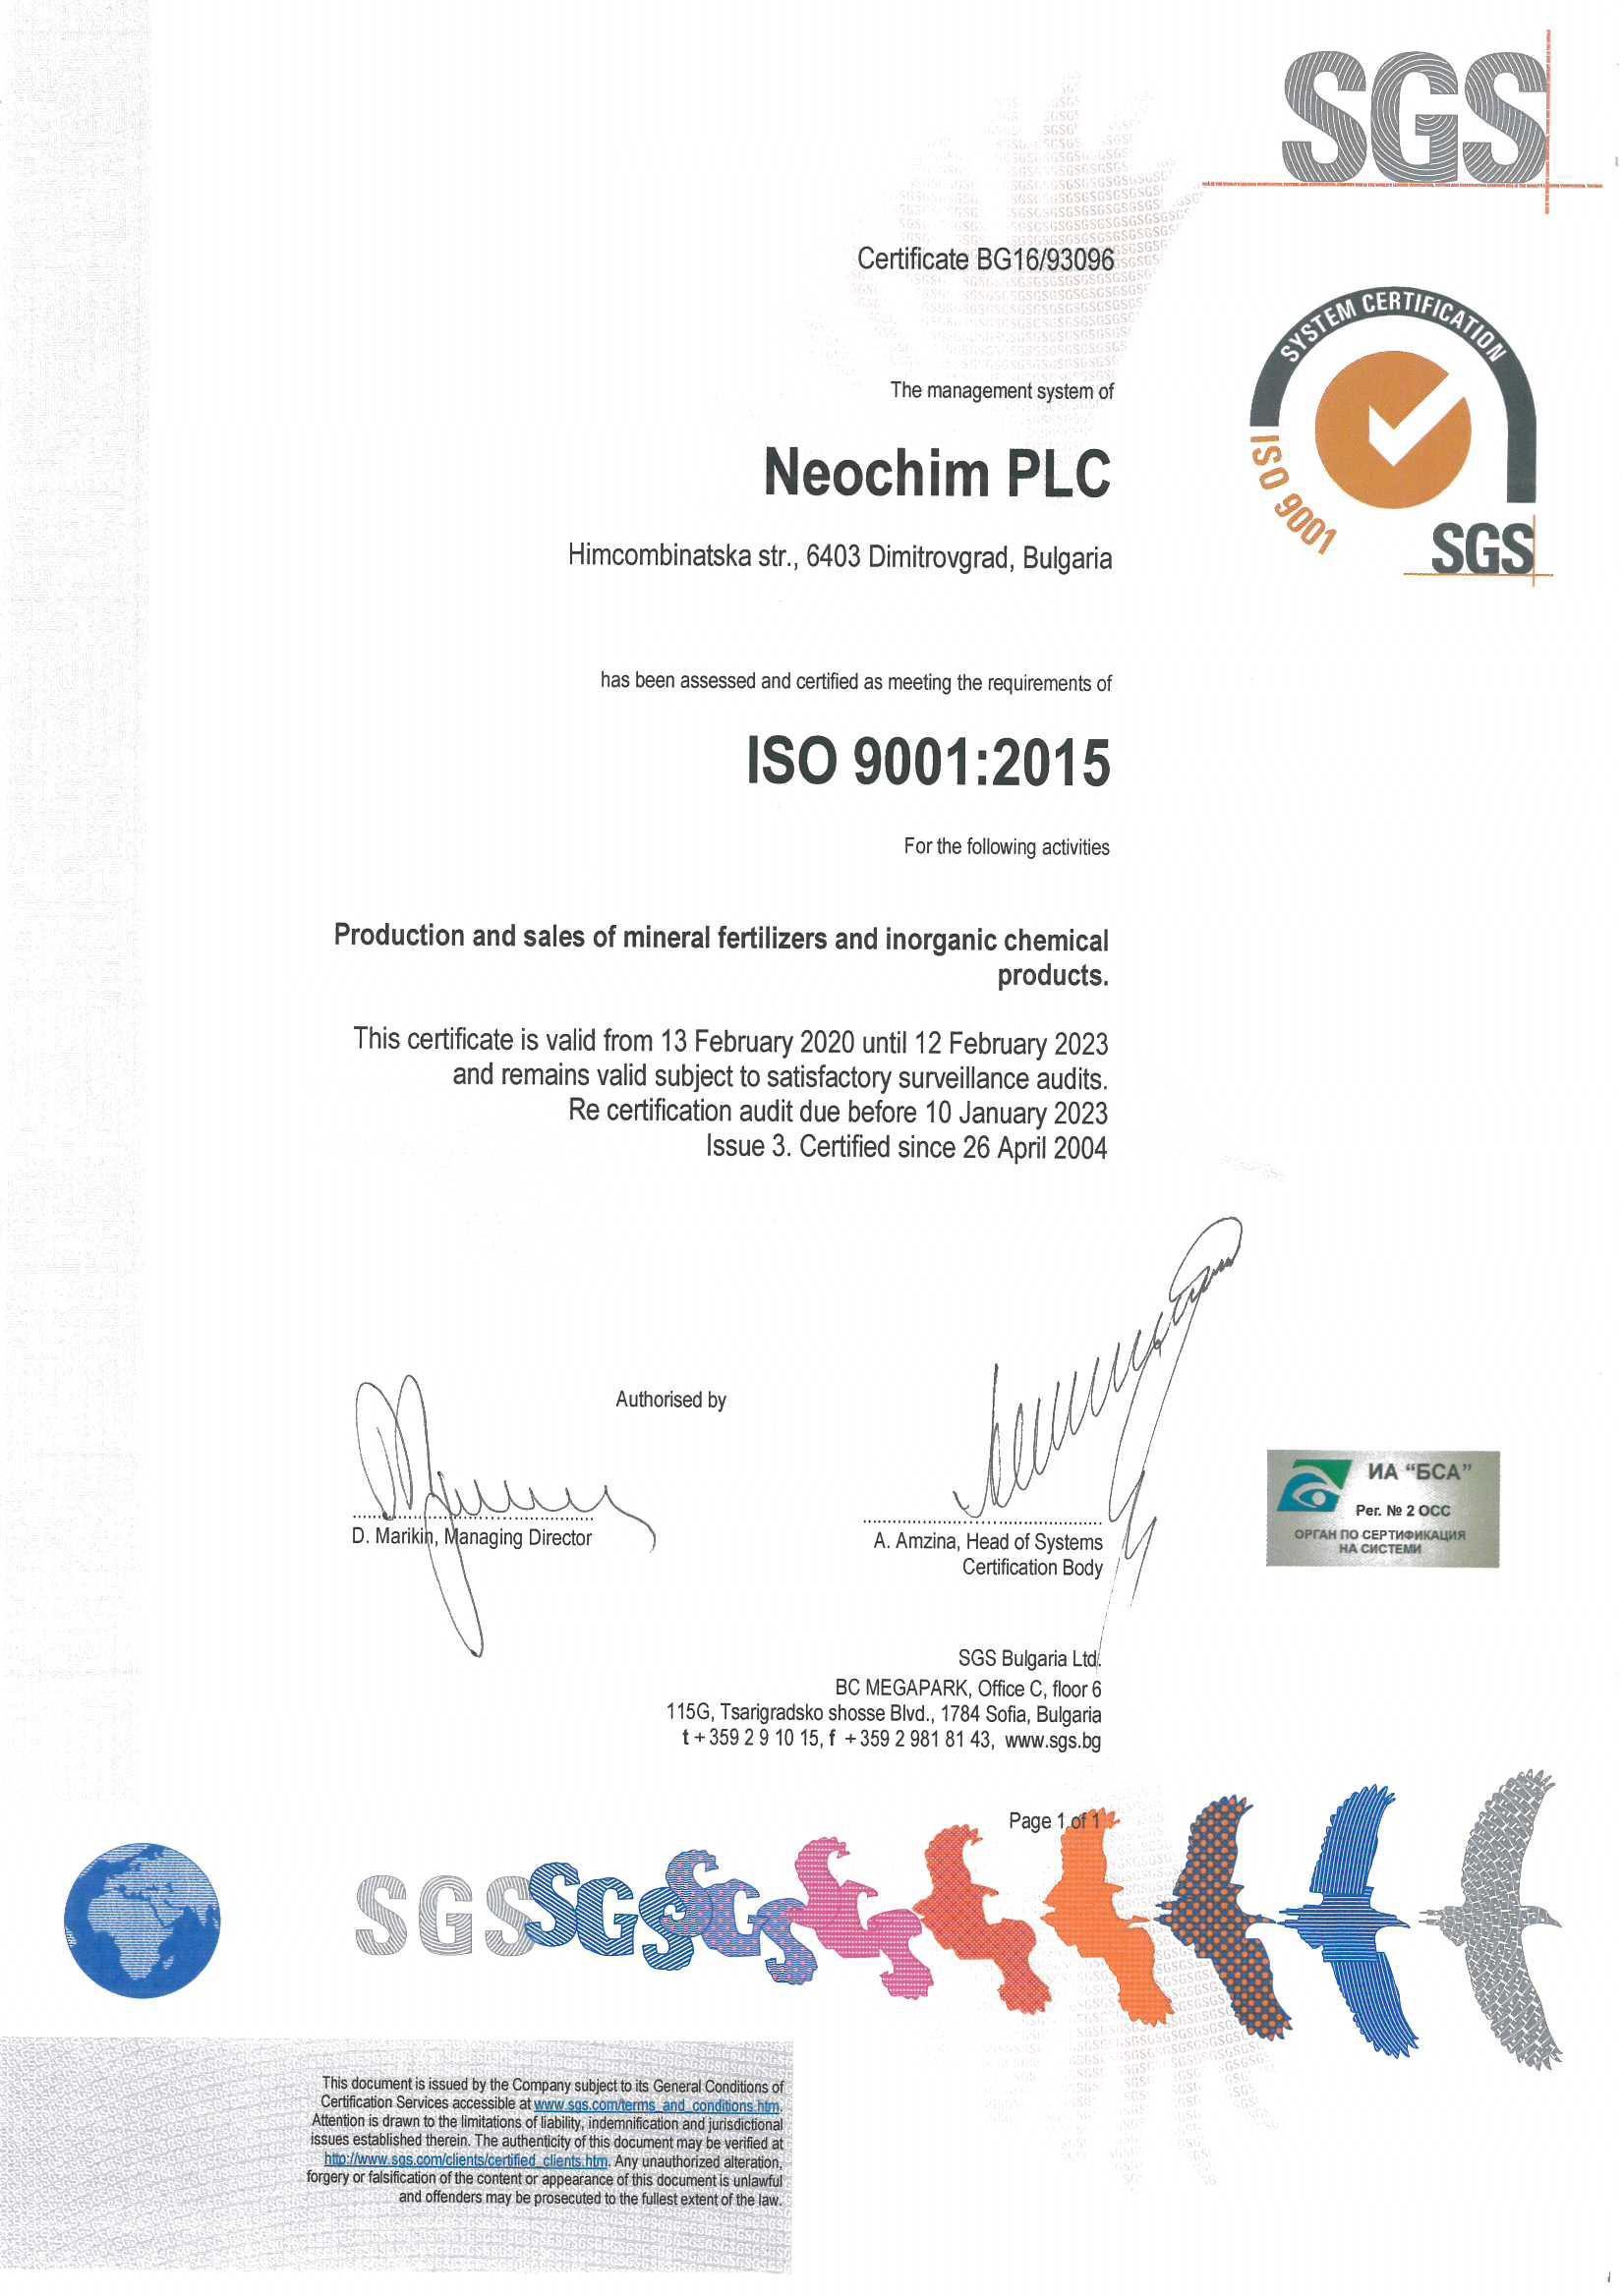 Neochim plc fertilizers organic and inorganic chemicals certificate iso 90012015 xflitez Choice Image